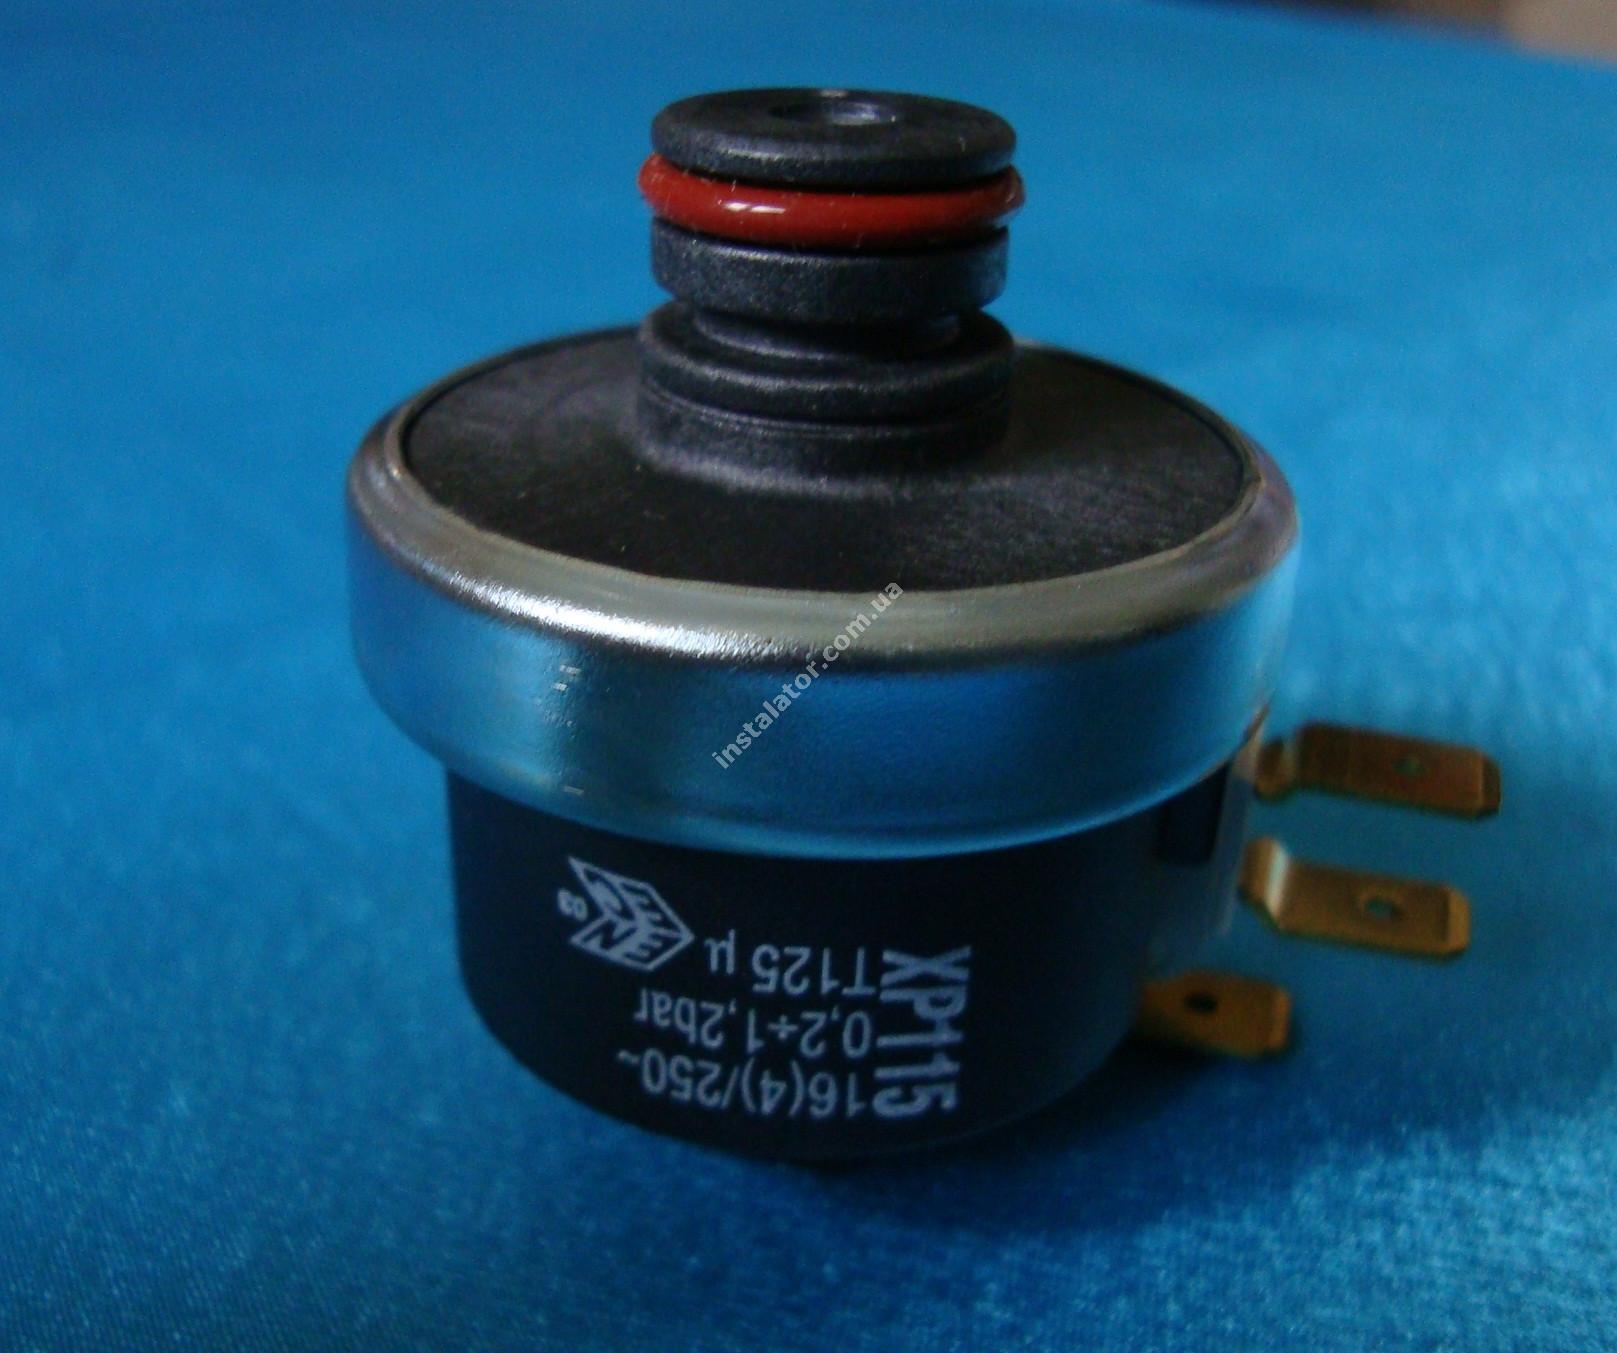 6PRESSAC01 Реле давления воды Vela Compact 0,2-1,2 бар full-image-6